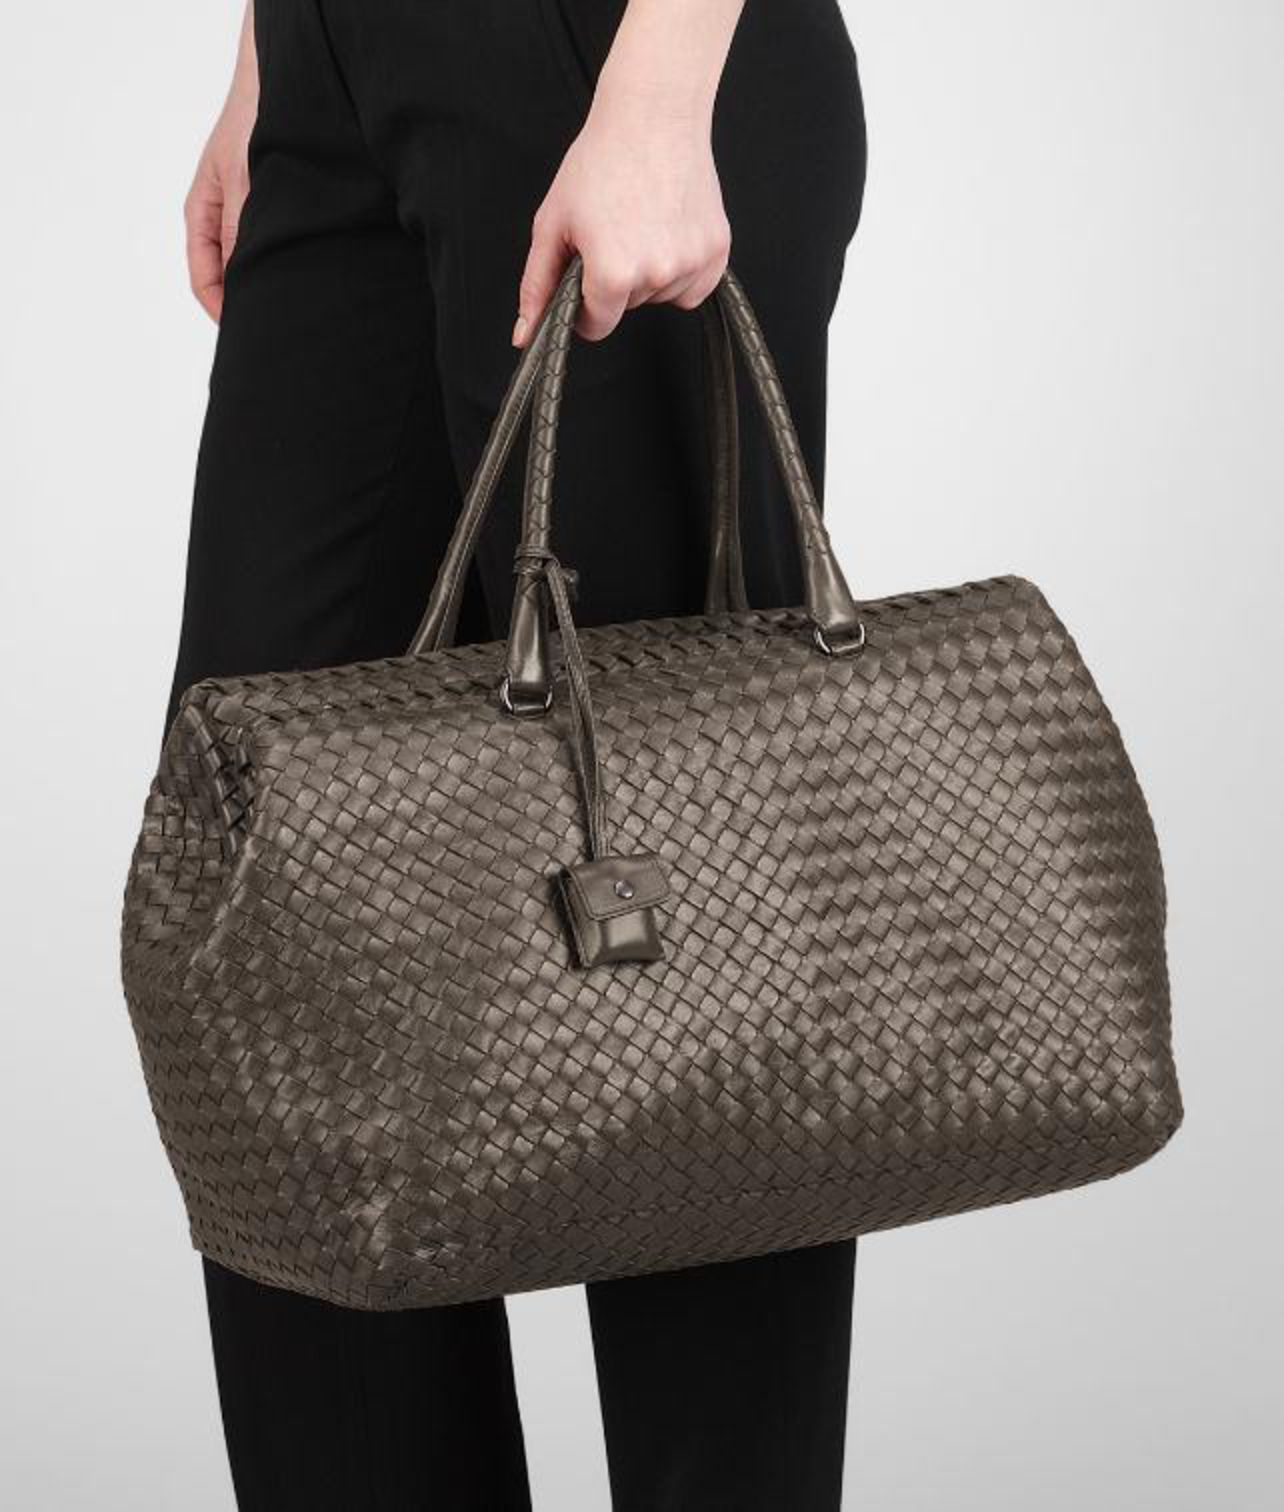 53b2bfa2a2 Bottega Veneta Shadow Intrecciato Nappa Brick Bag in Gray - Lyst